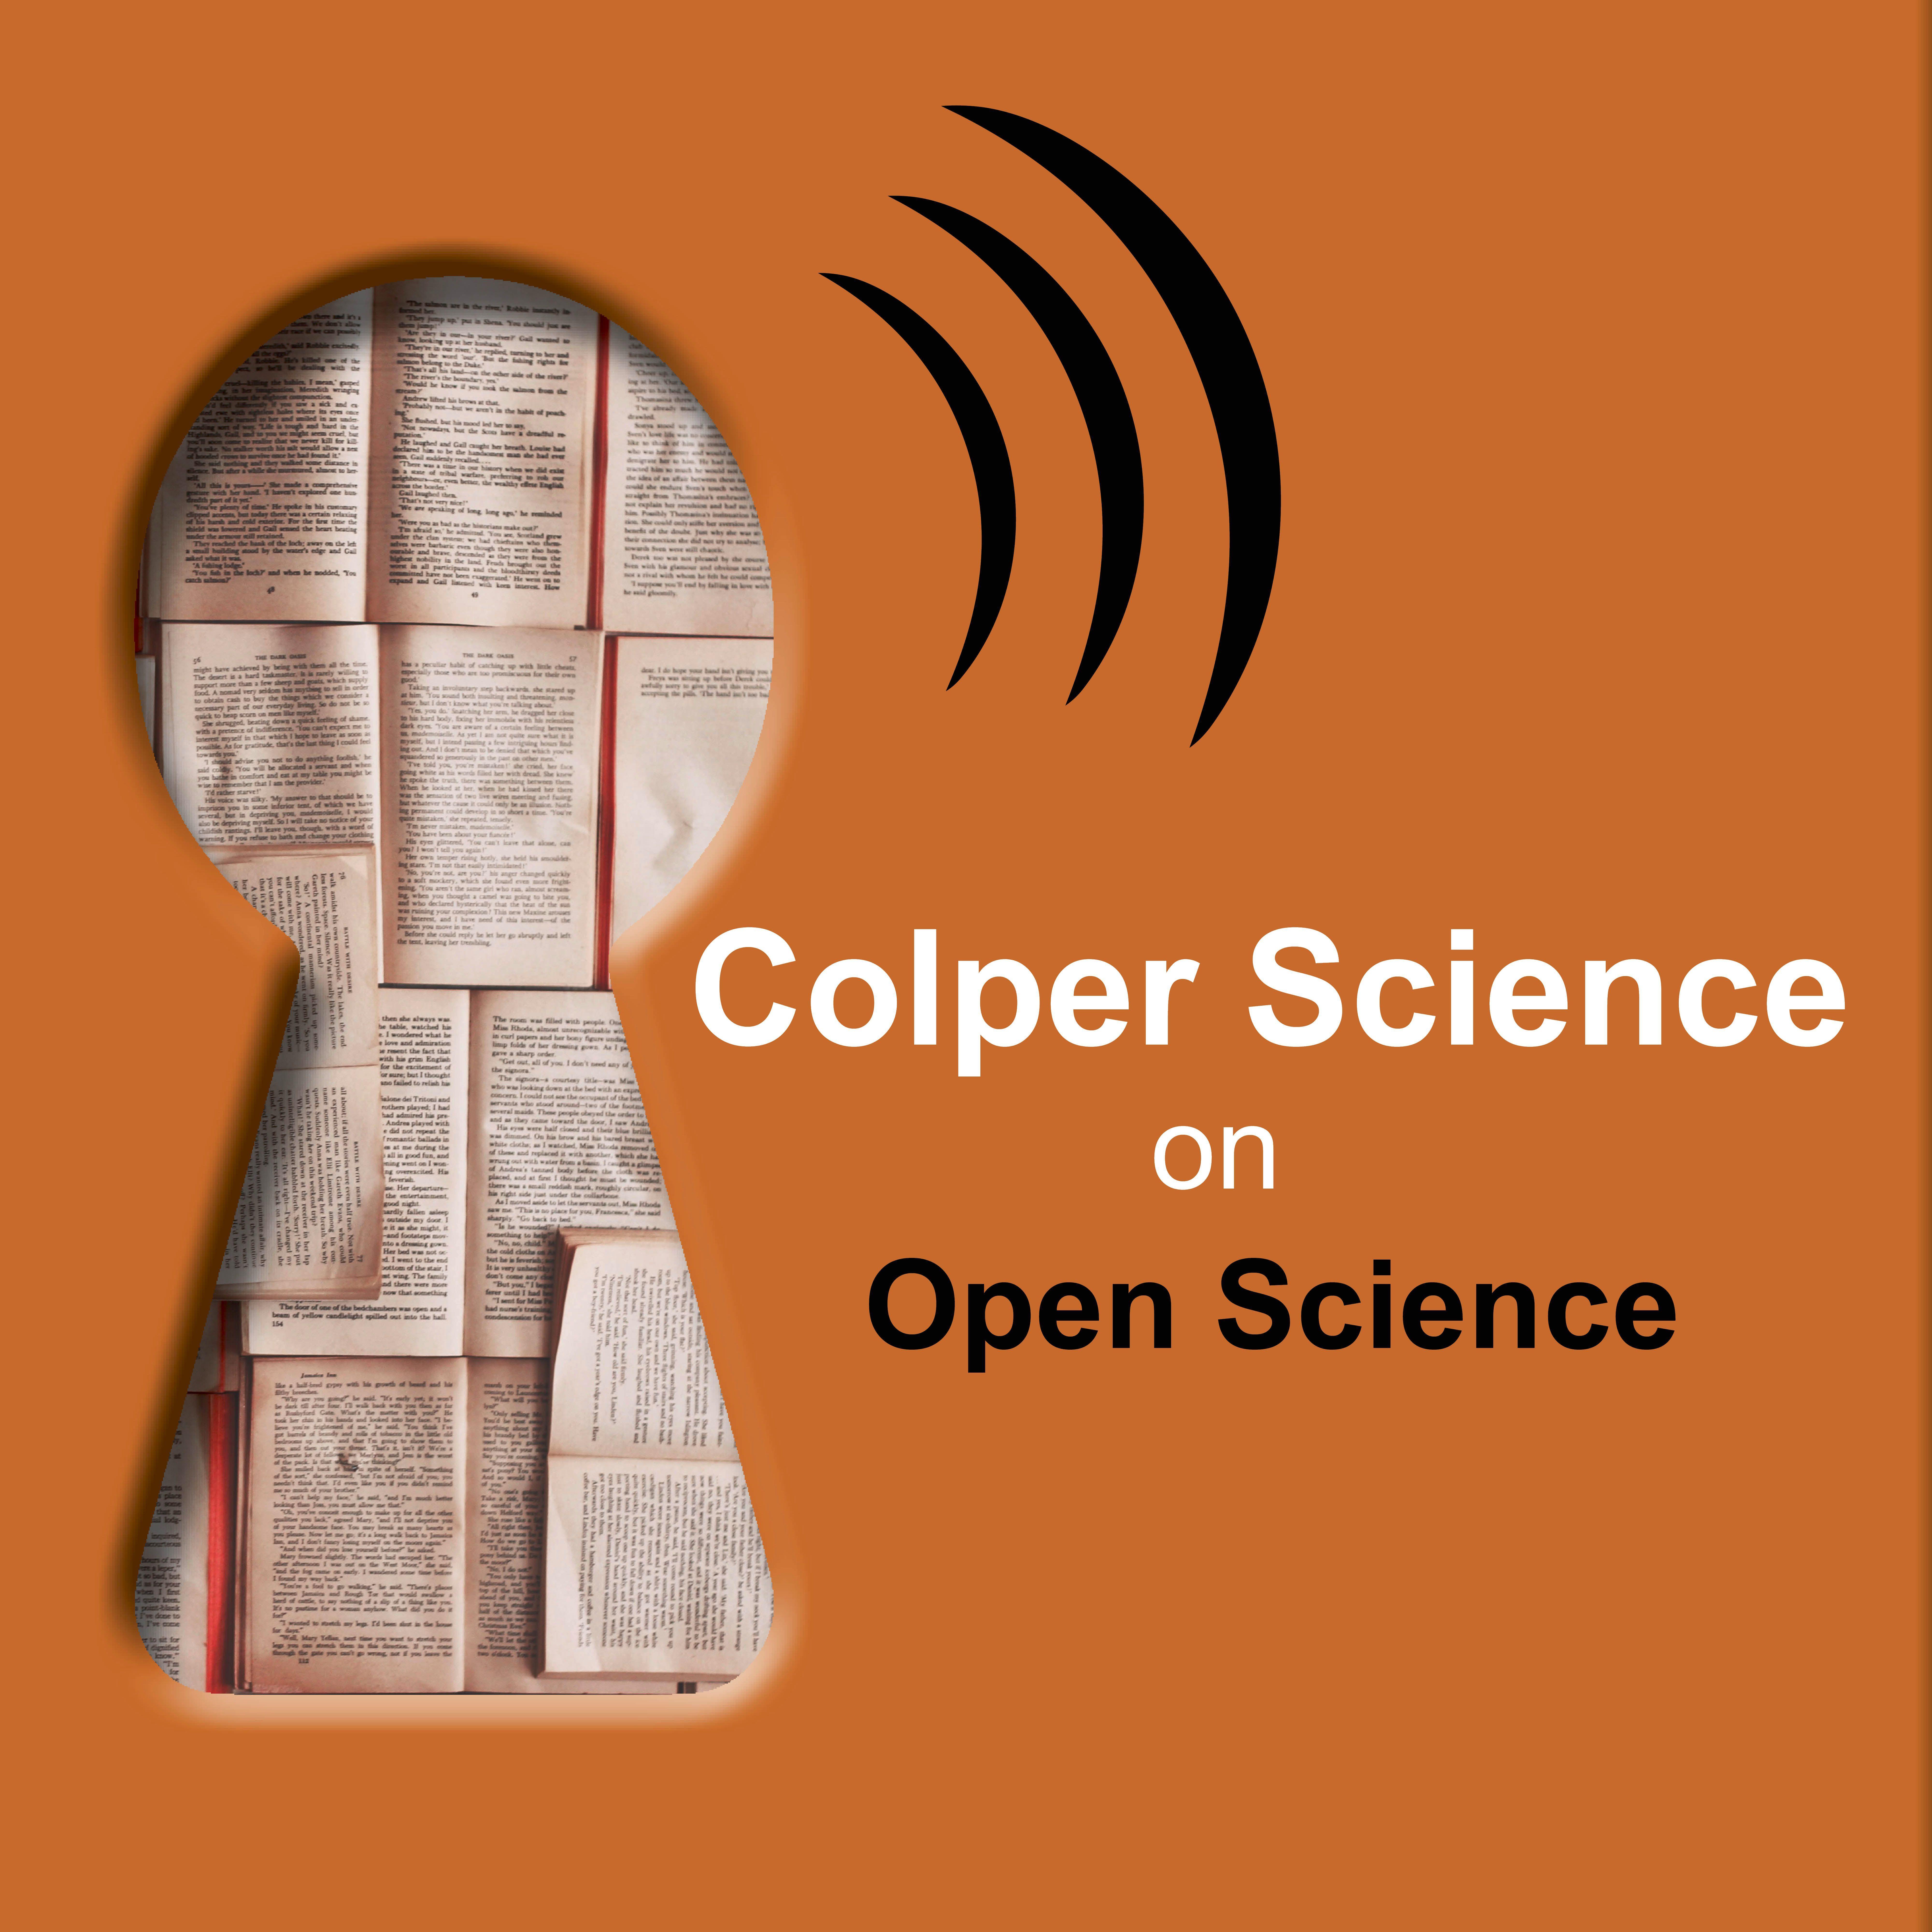 Episode 07 - Open access publishing platform using the blockchain technology with Kade Morton